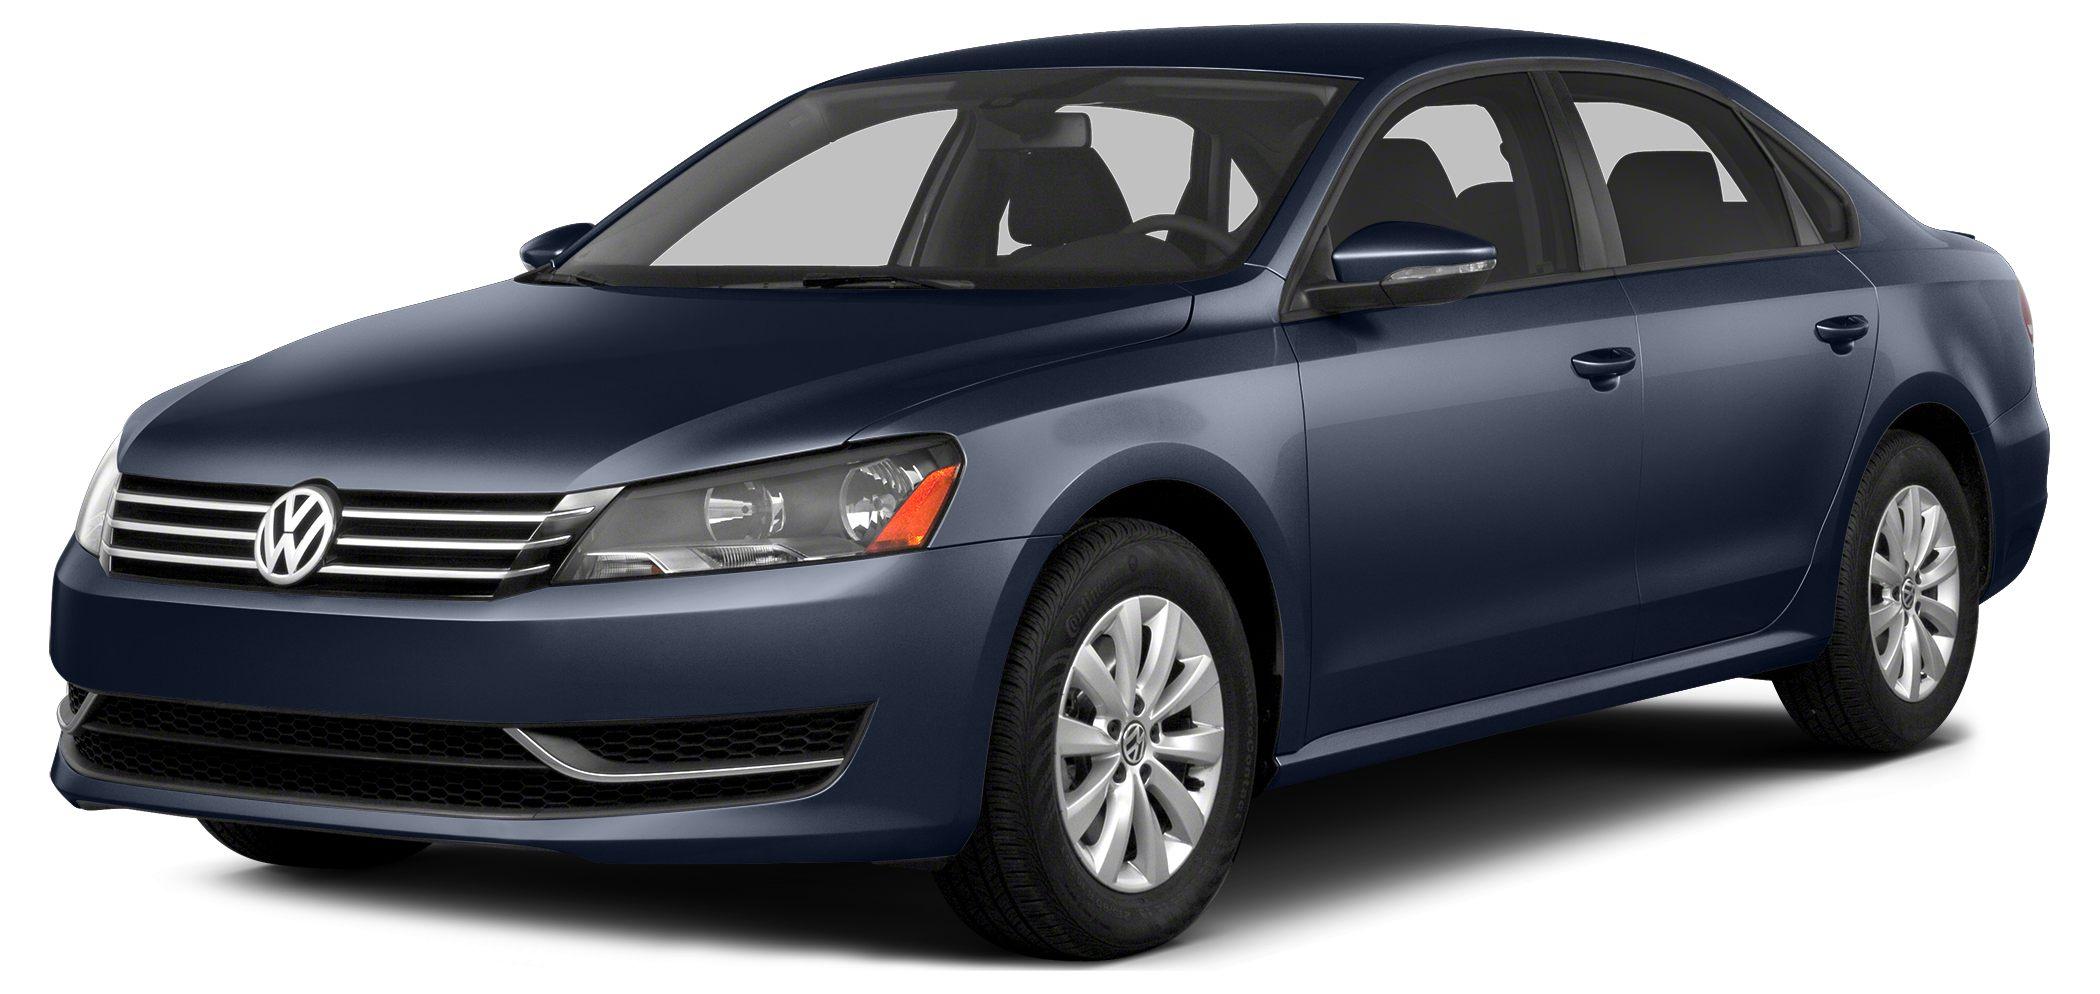 2014 Volkswagen Passat 20 TDI SE CARFAX 1-Owner Excellent Condition LOW MILES - 14752 1900